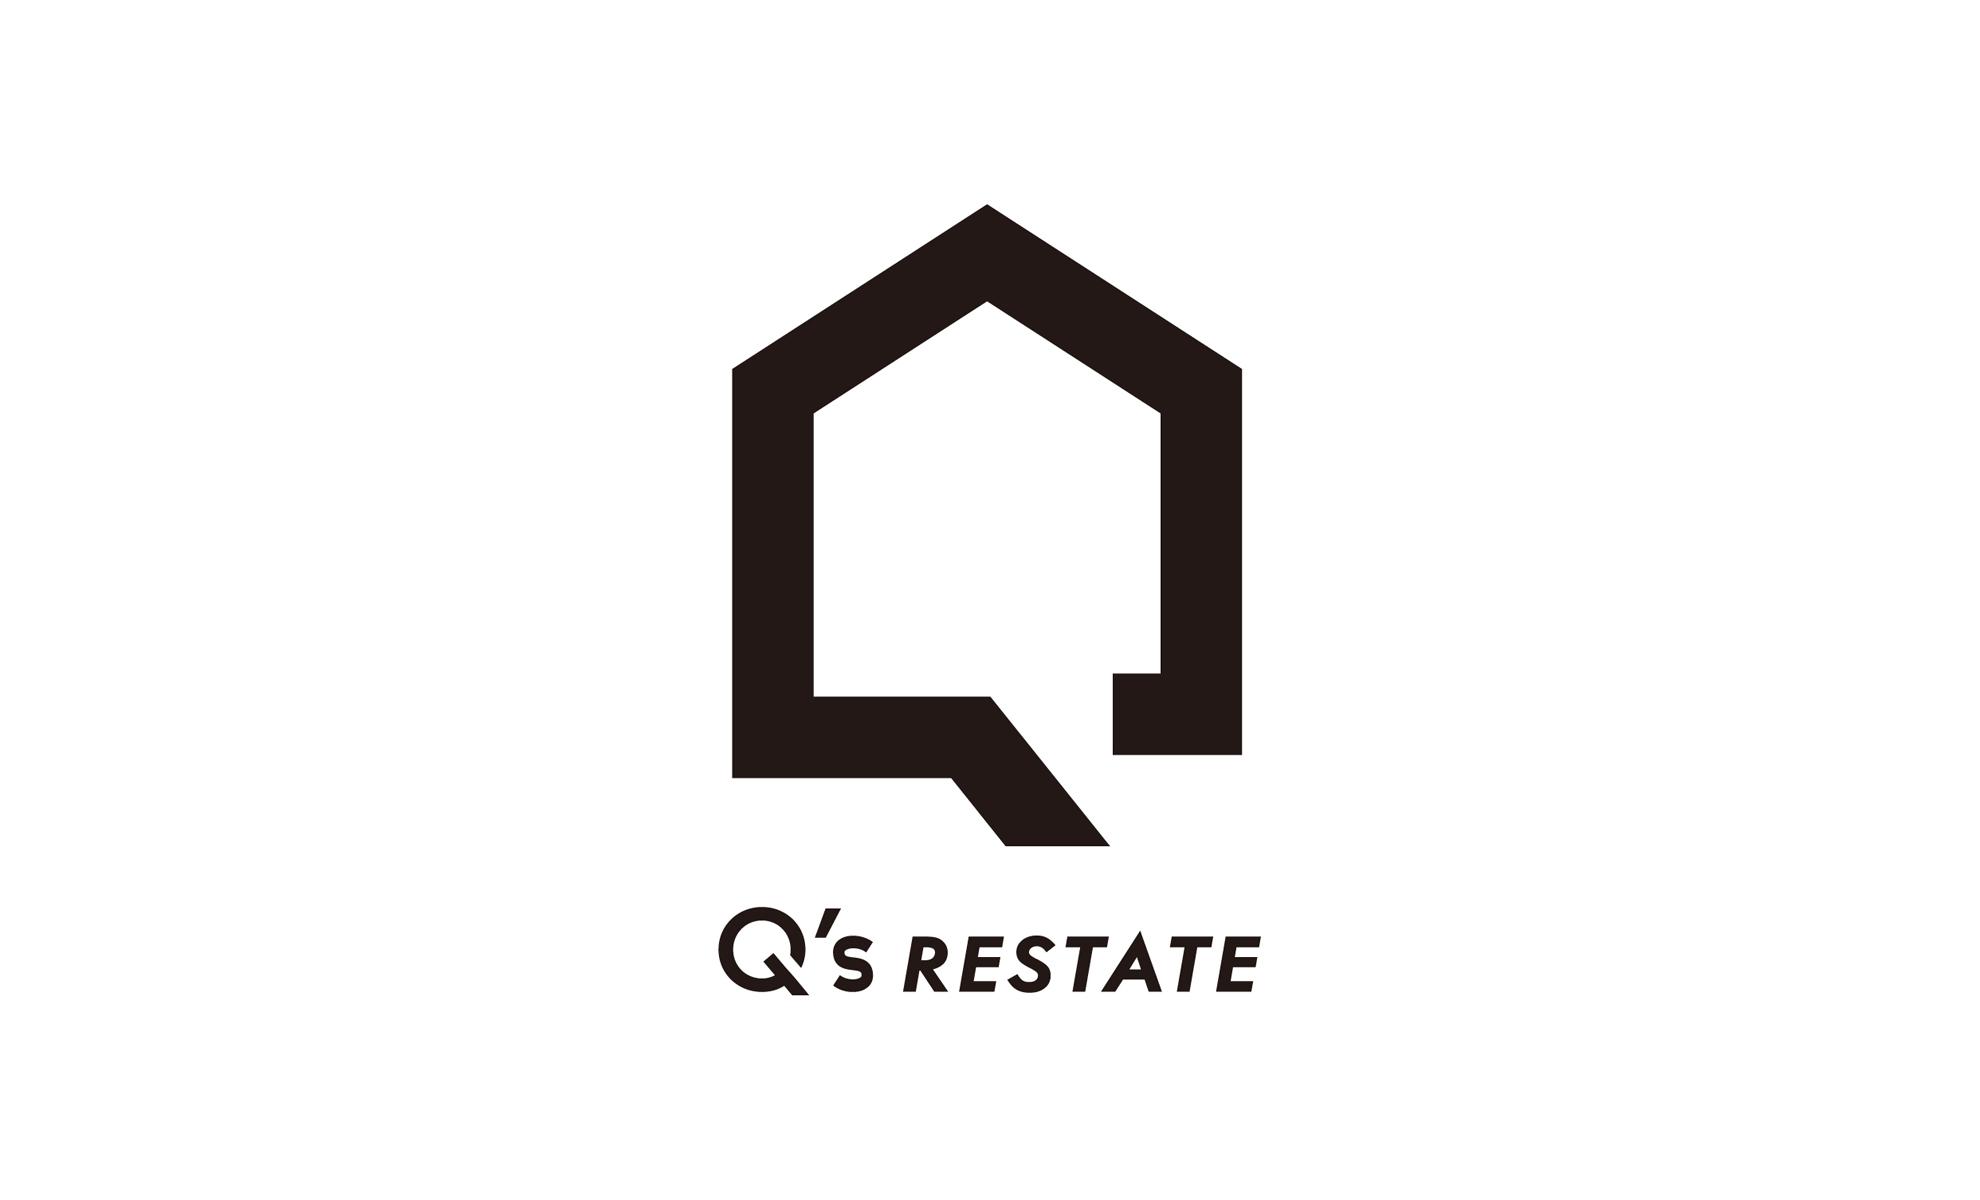 Q's Restate Logo